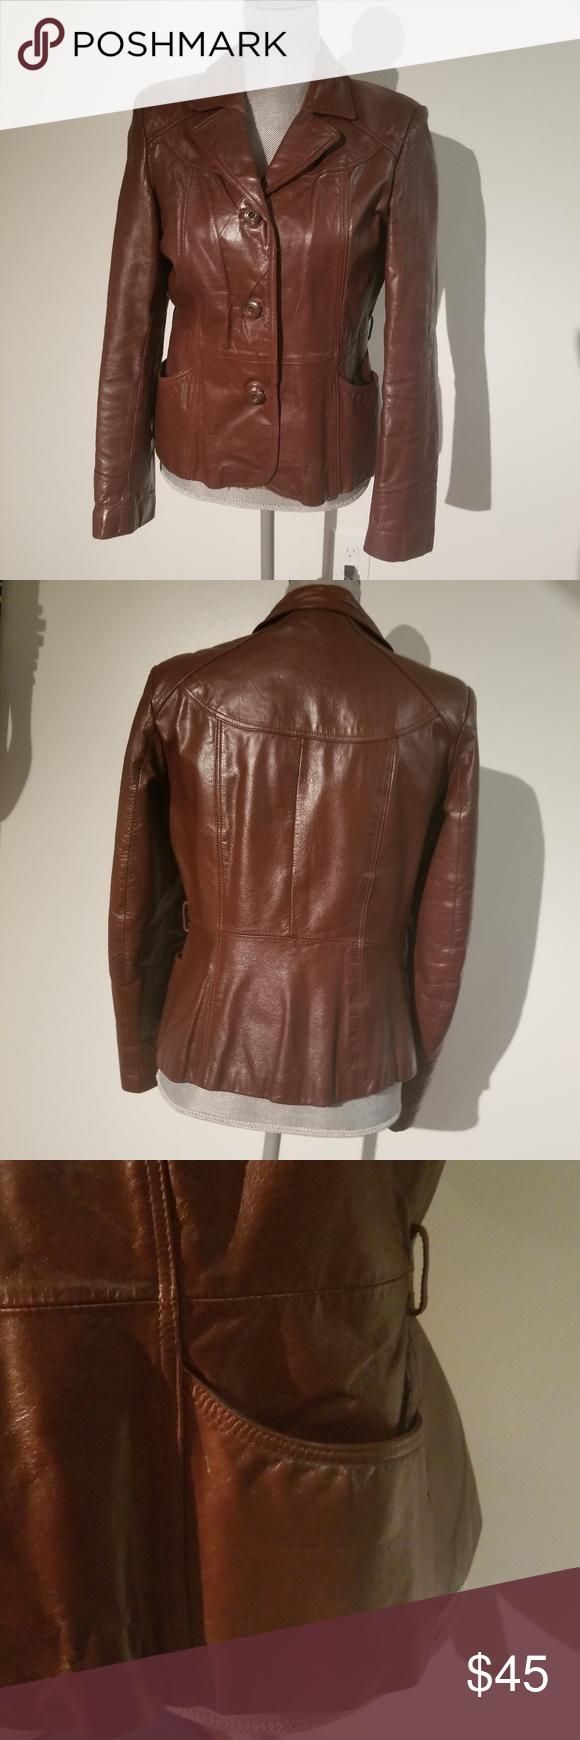 145631b6f Vintage Wilson Leather Jacket W/ Pockets Genuine leather size 10 ...